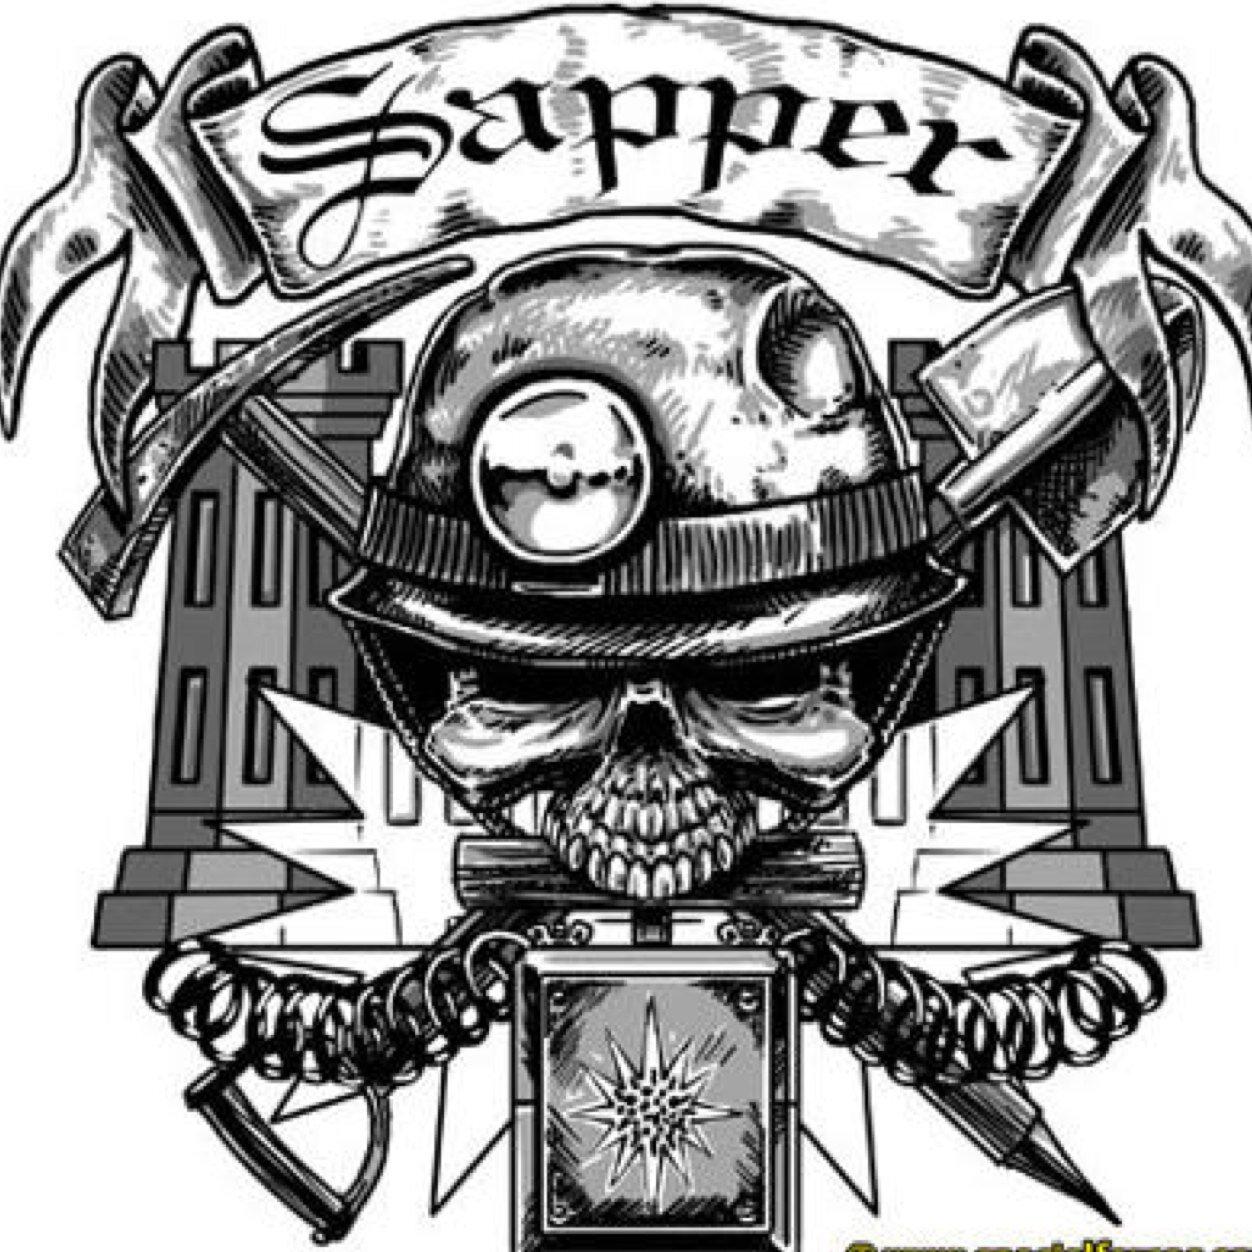 Sappers-12-Bravo (@Sappers12Bravo)